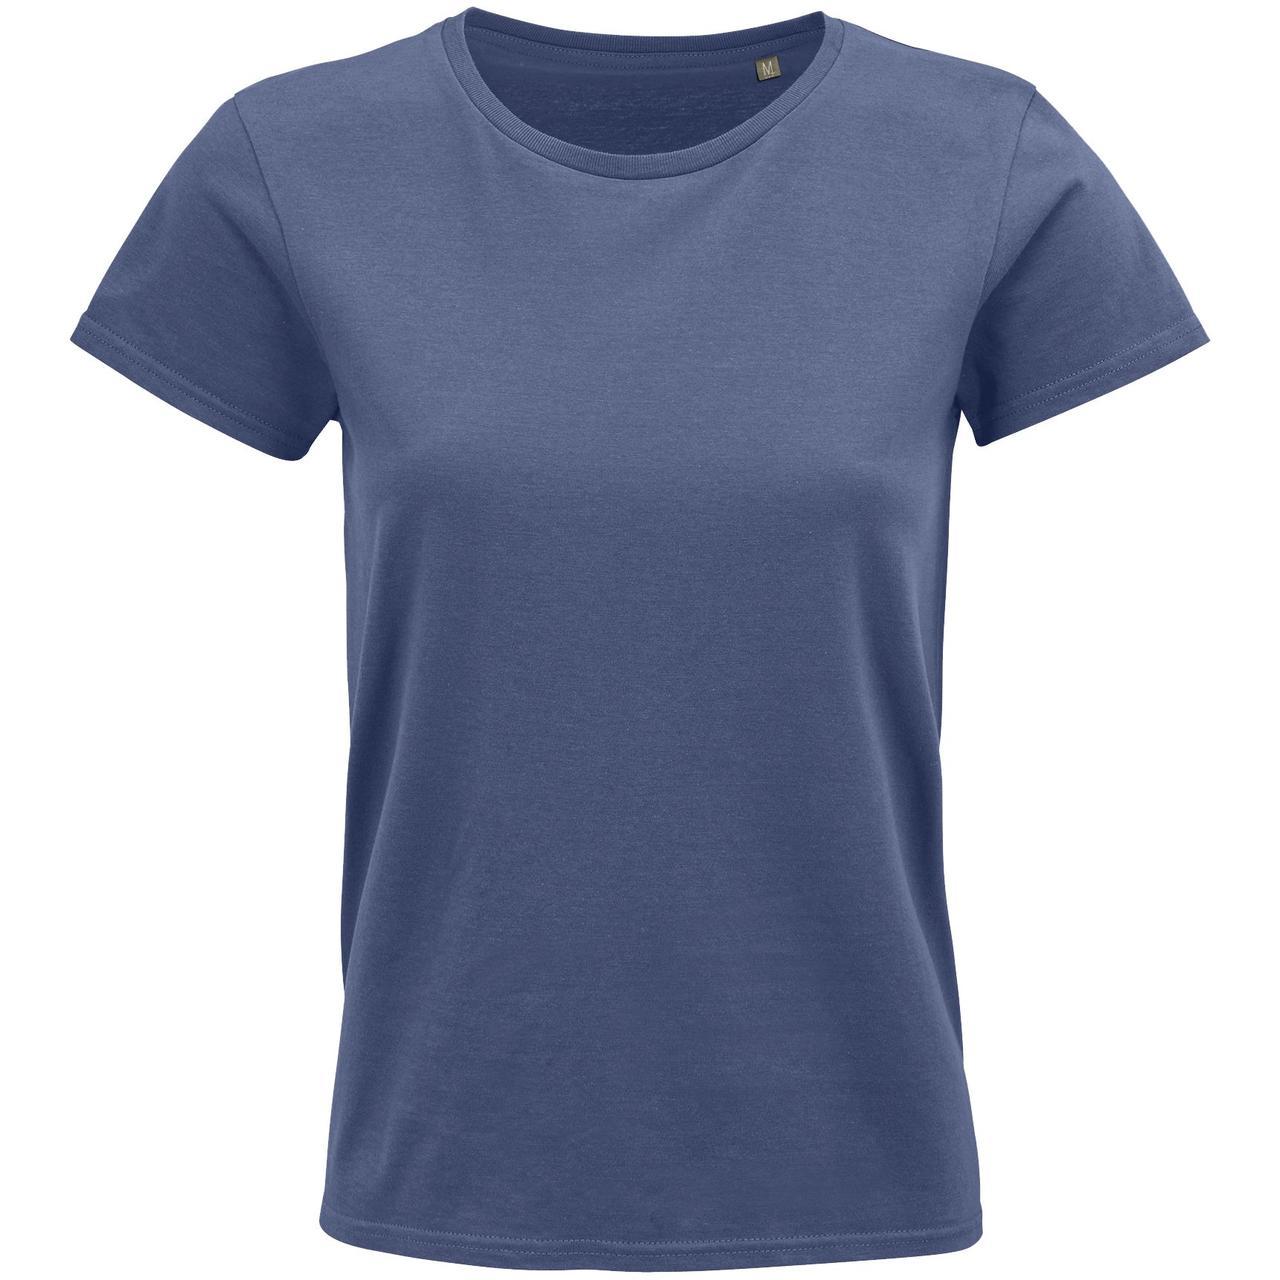 Футболка женская Crusader Women, синяя (джинс) (артикул 03581244)